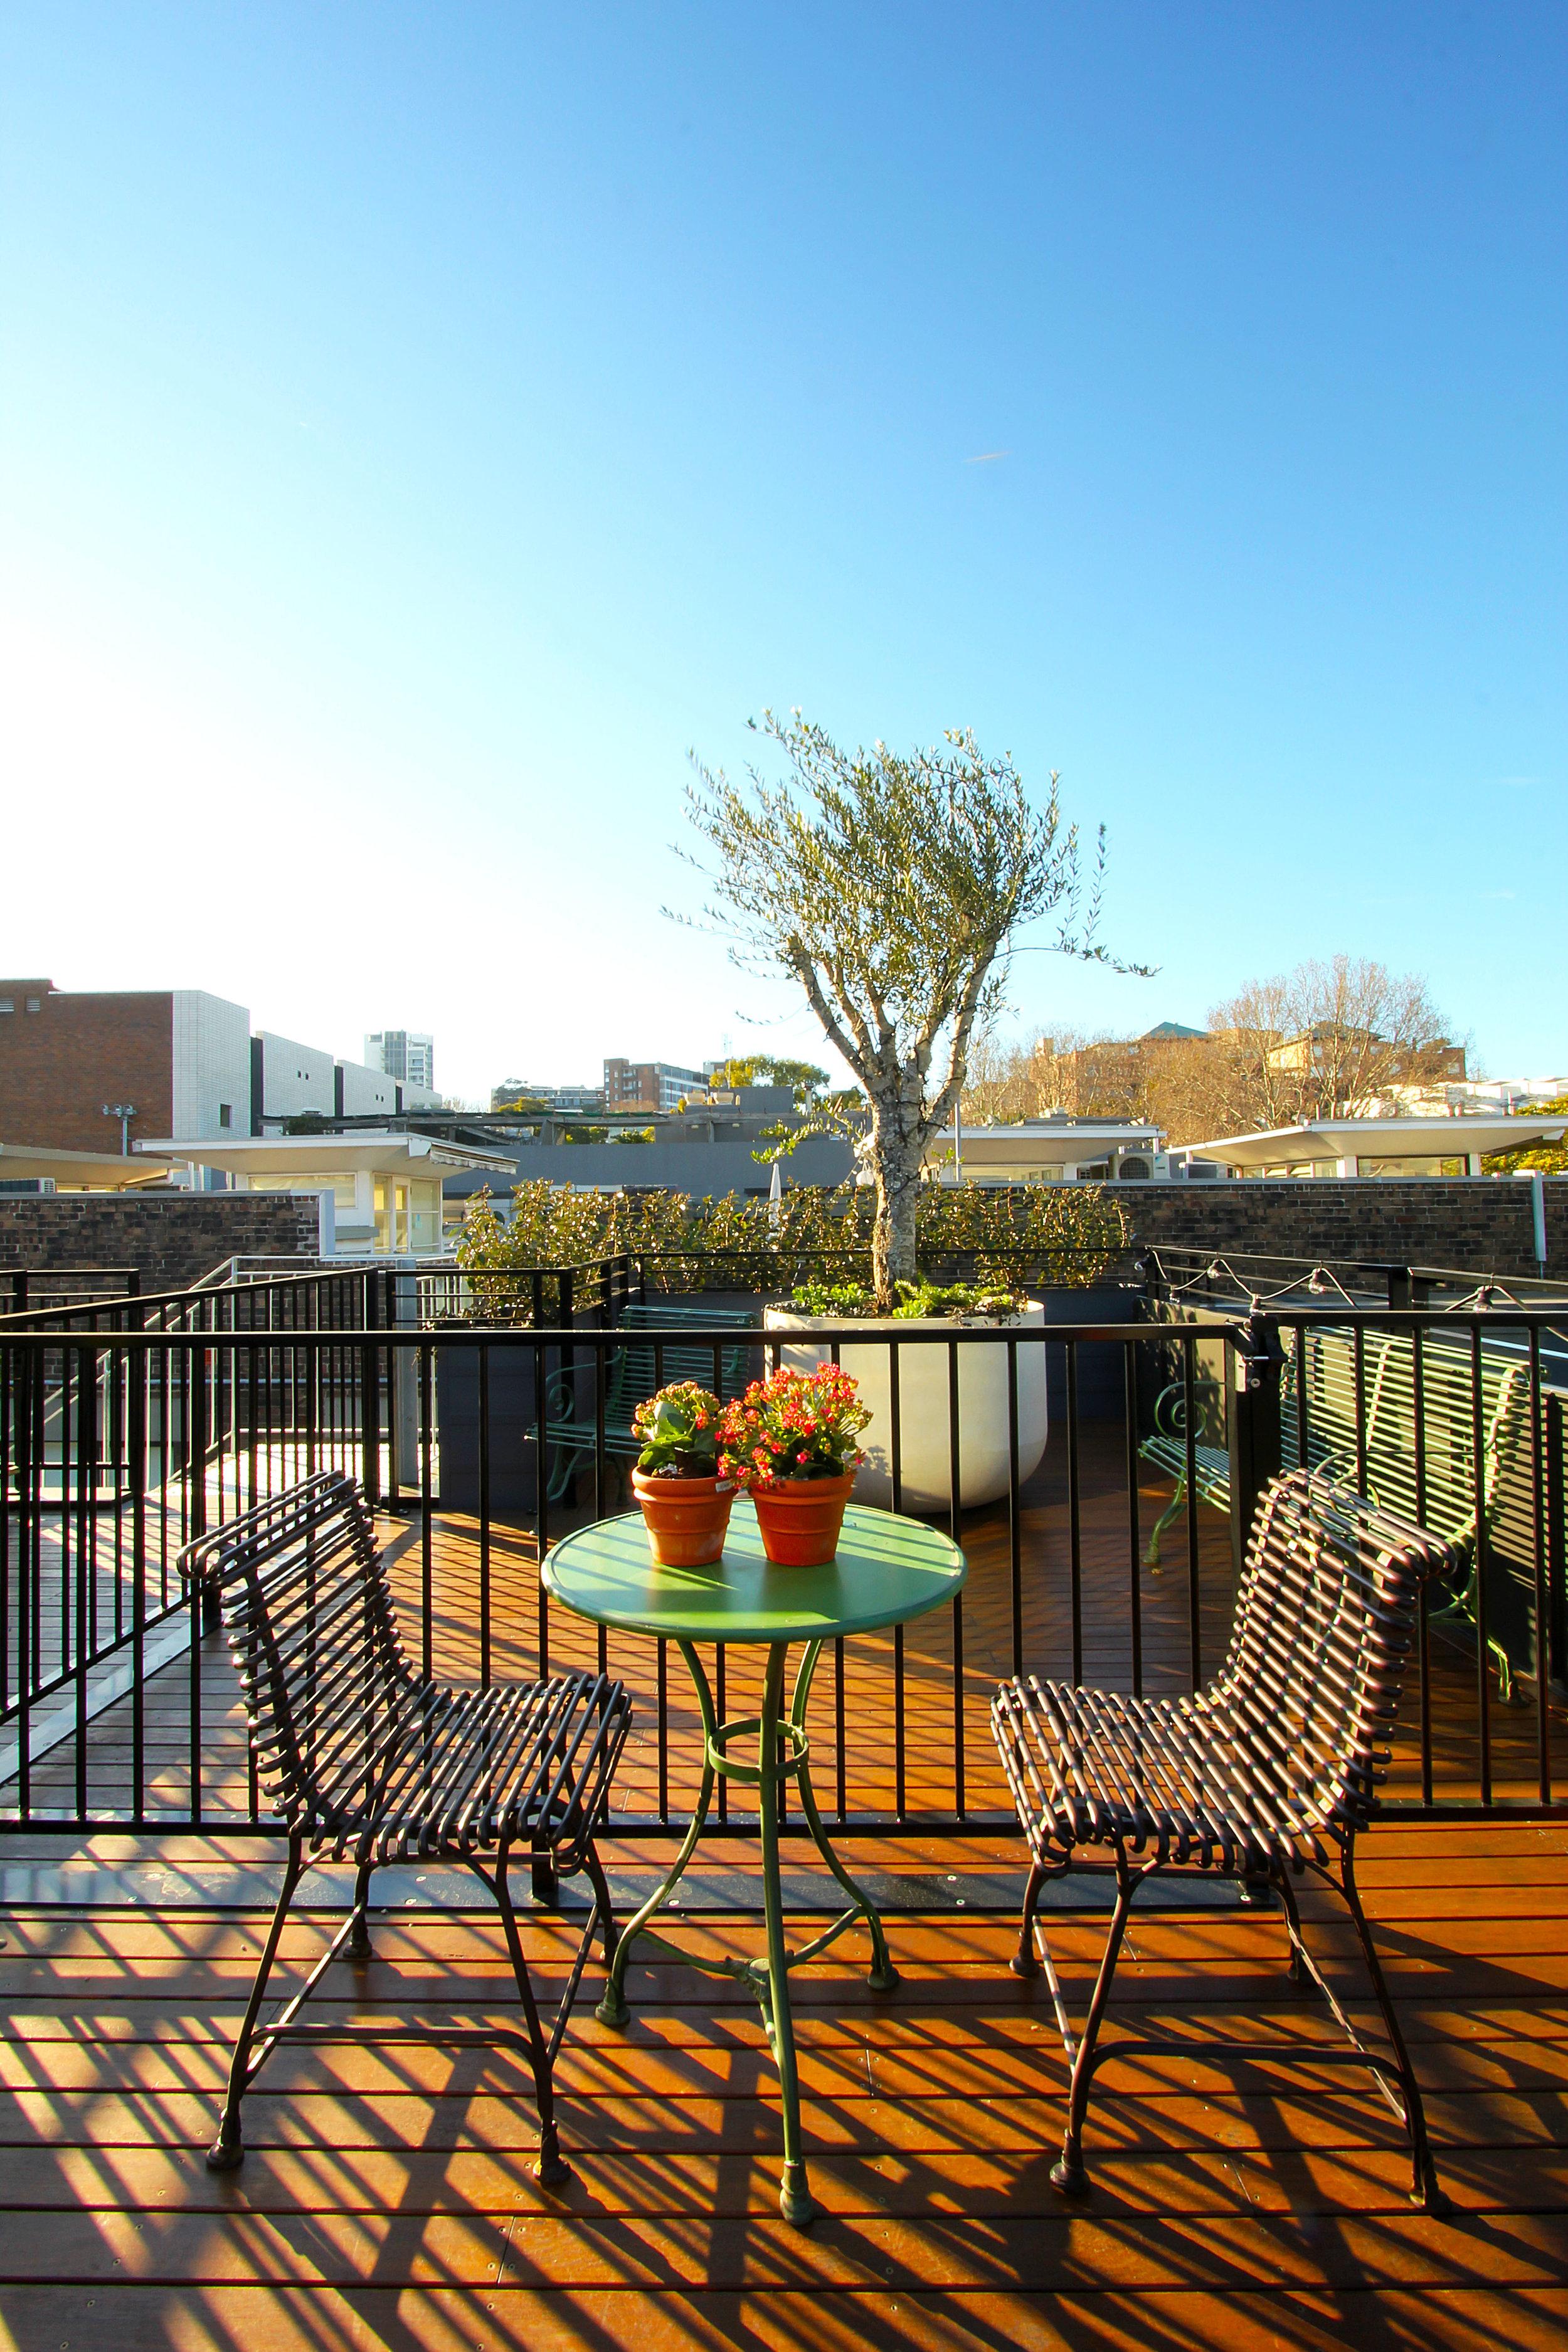 TYA Photography | Little Albion Guest House | Secret Rooftop Garden | Winter | Morning 01 | A9723.jpg